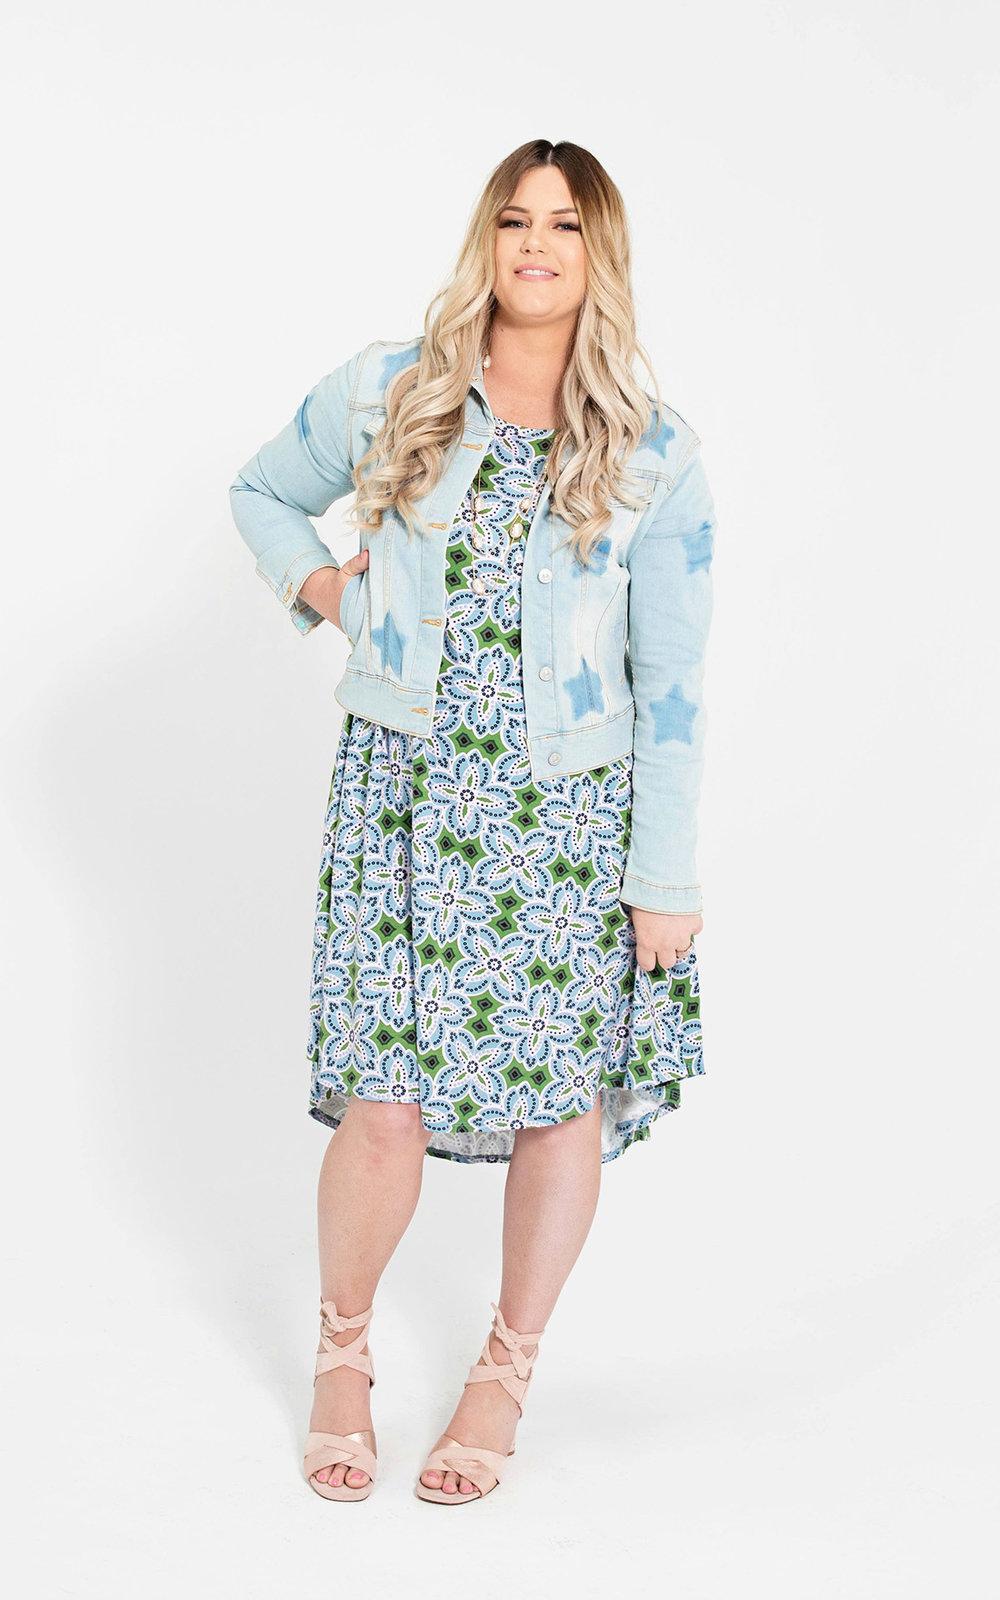 LuLaRoe-Carly-T-Shirt-High-Low-Dress-blue-and-green-floral-tile-art.jpg